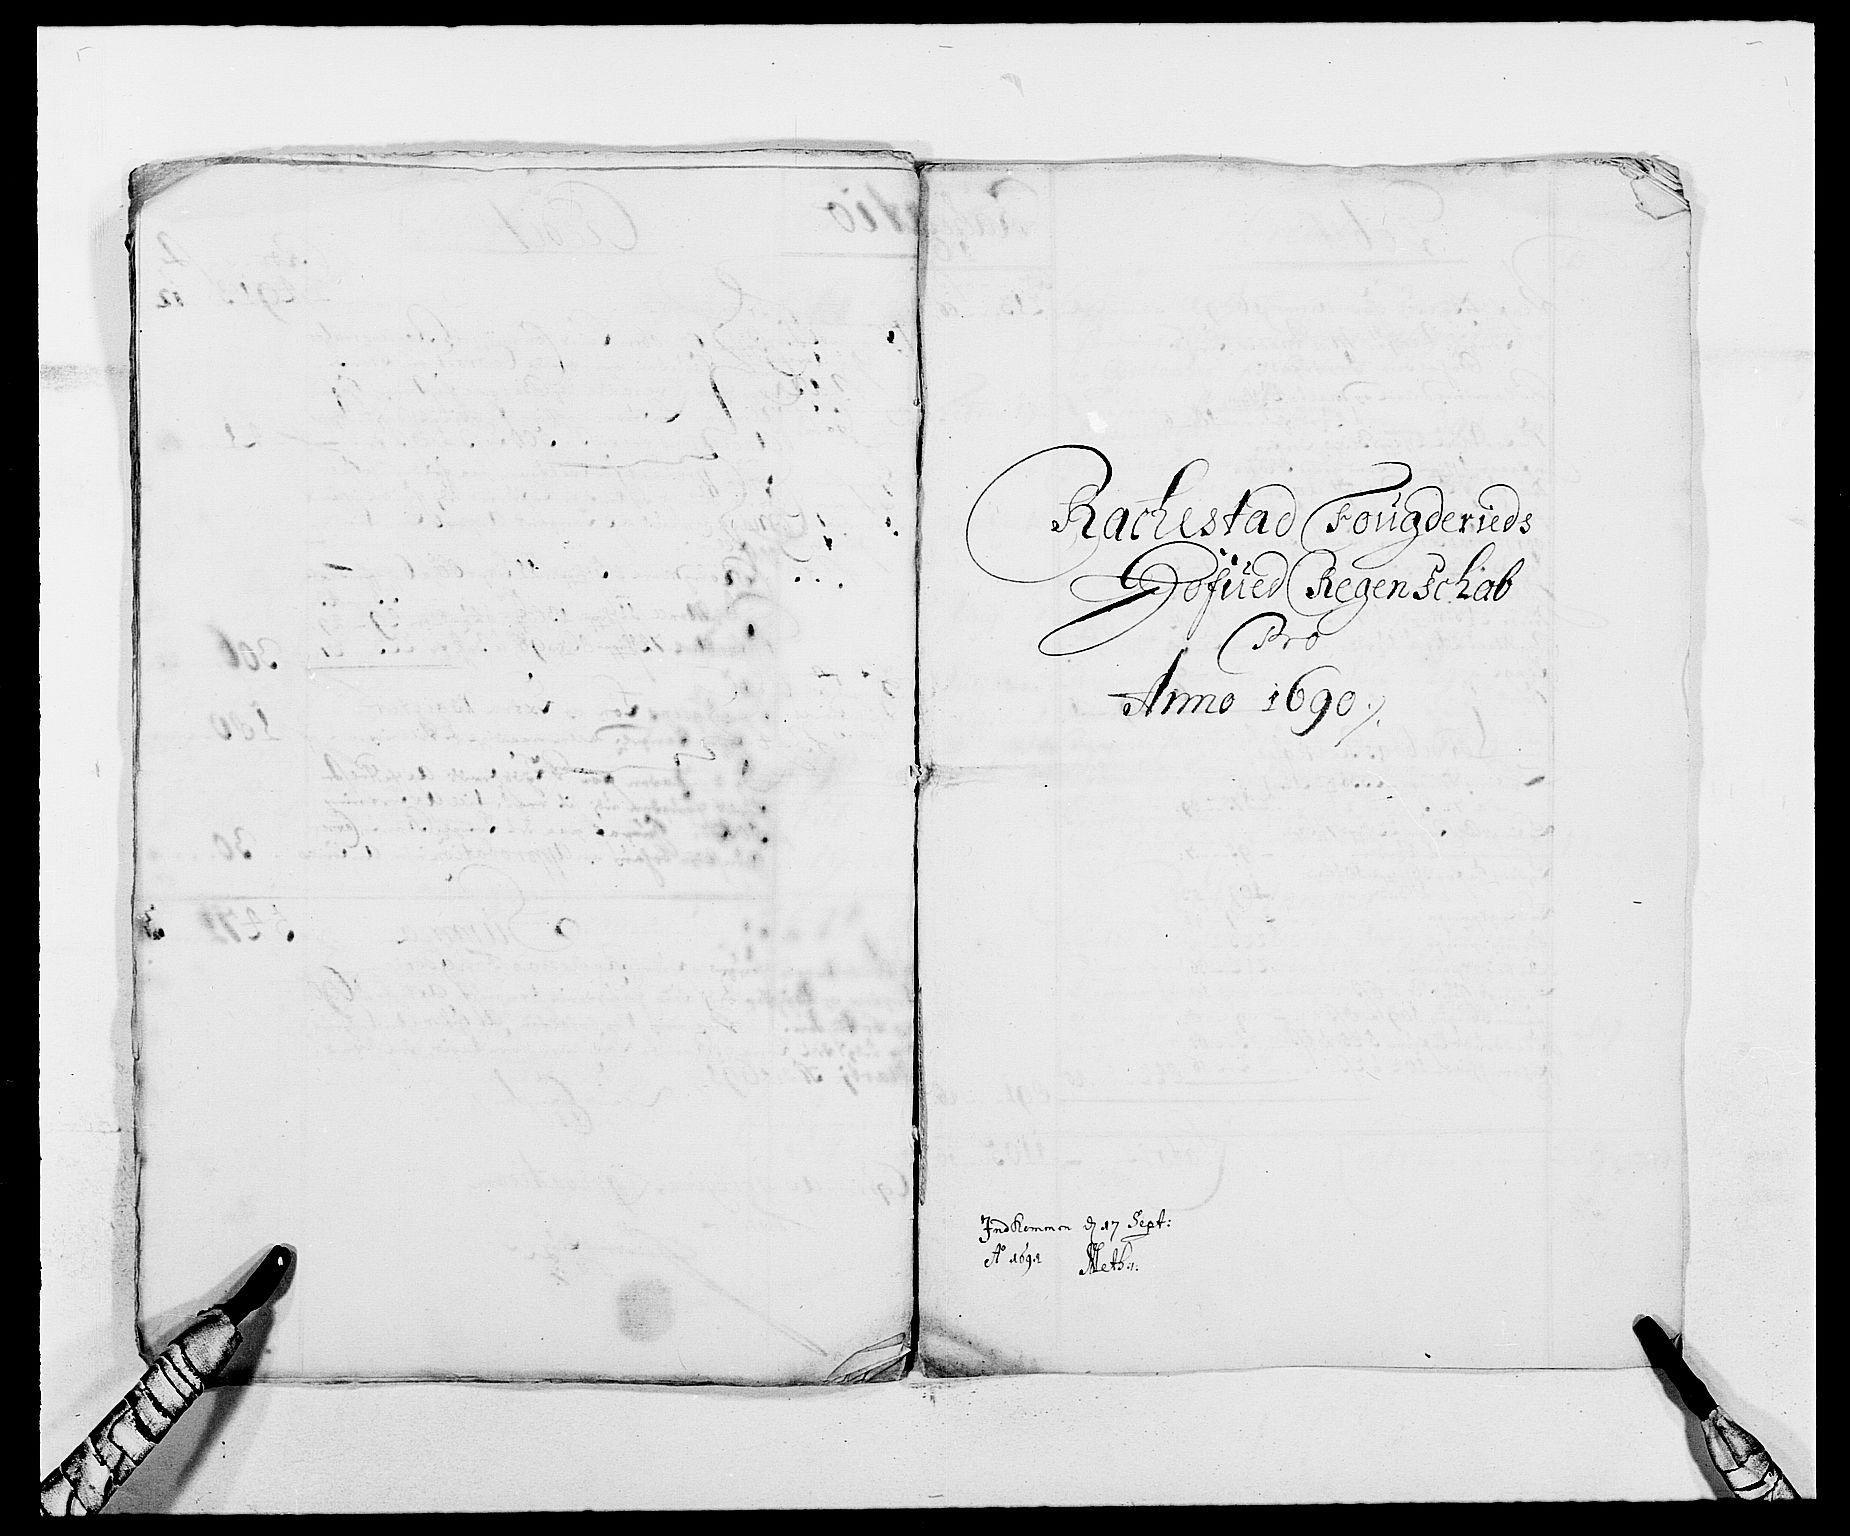 RA, Rentekammeret inntil 1814, Reviderte regnskaper, Fogderegnskap, R05/L0277: Fogderegnskap Rakkestad, 1689-1690, s. 313